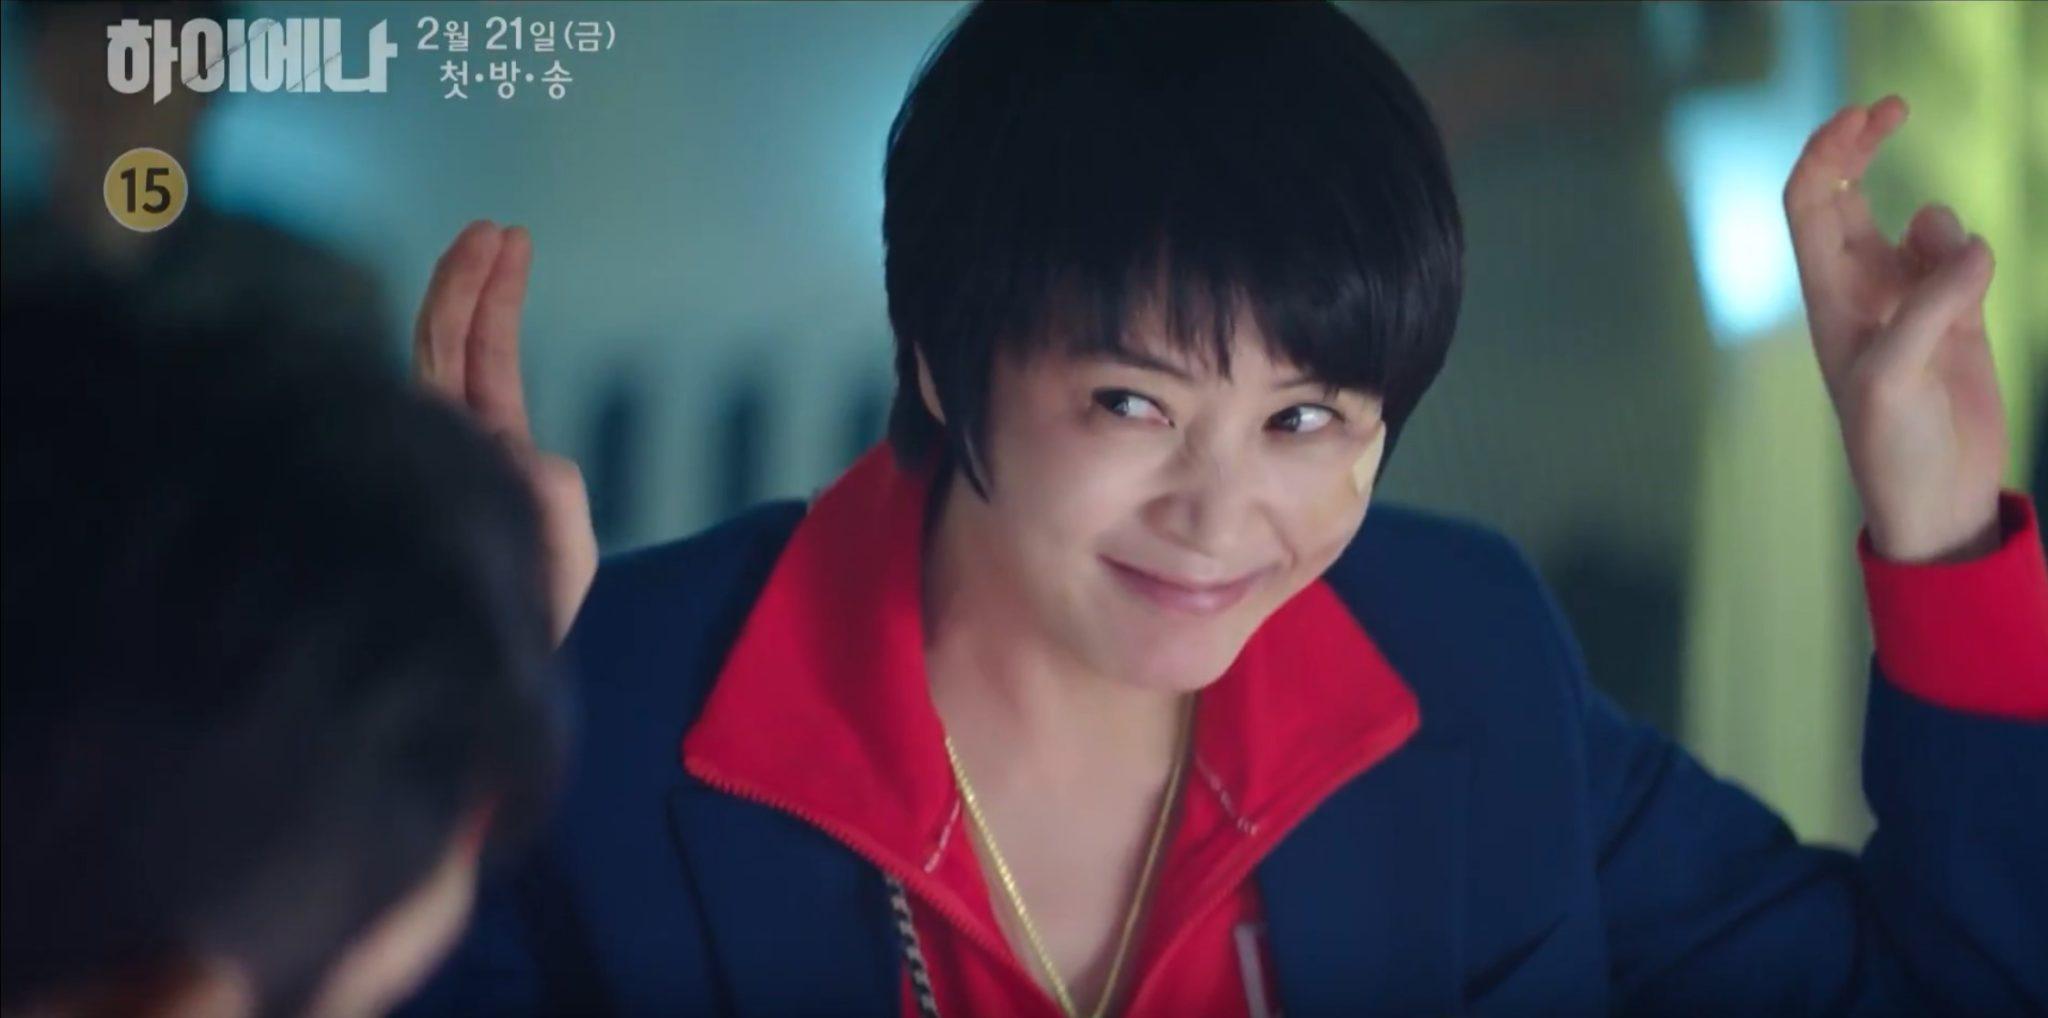 Kim Hye-soo, Joo Ji-hoon are on the prowl in new character teasers for SBS's Hyena